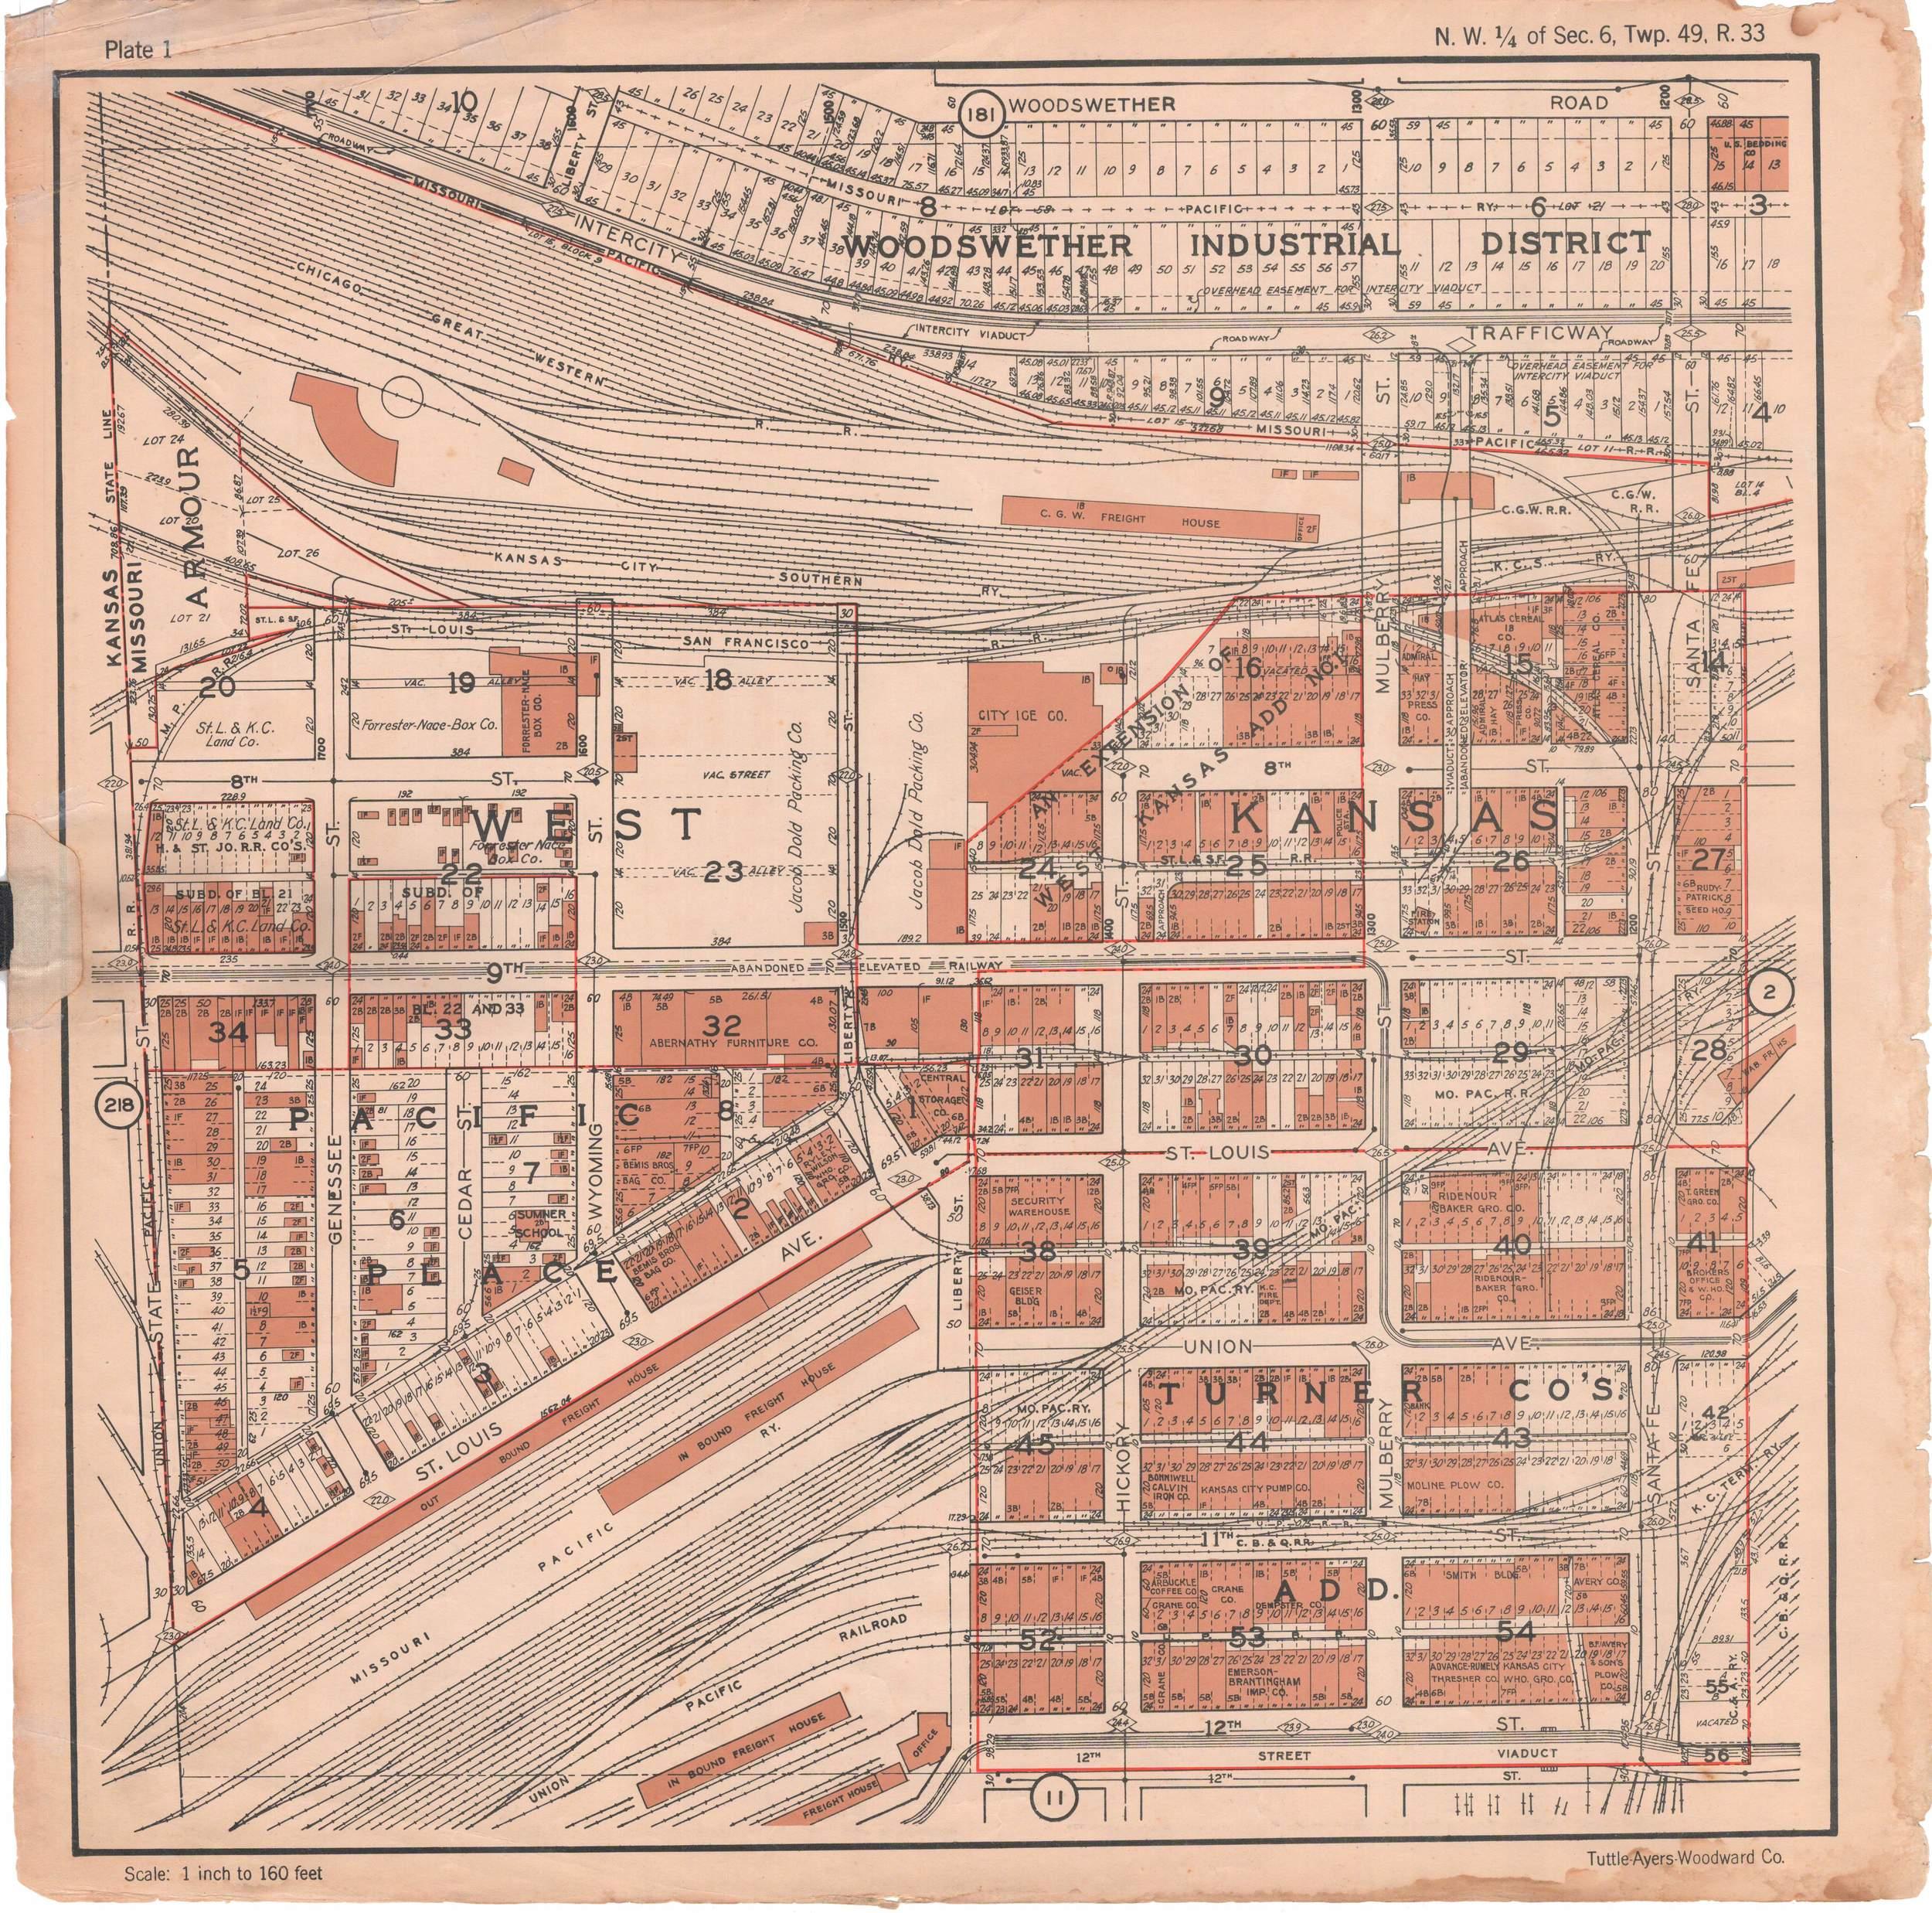 1925 TUTTLE_AYERS_Plate 1.JPG